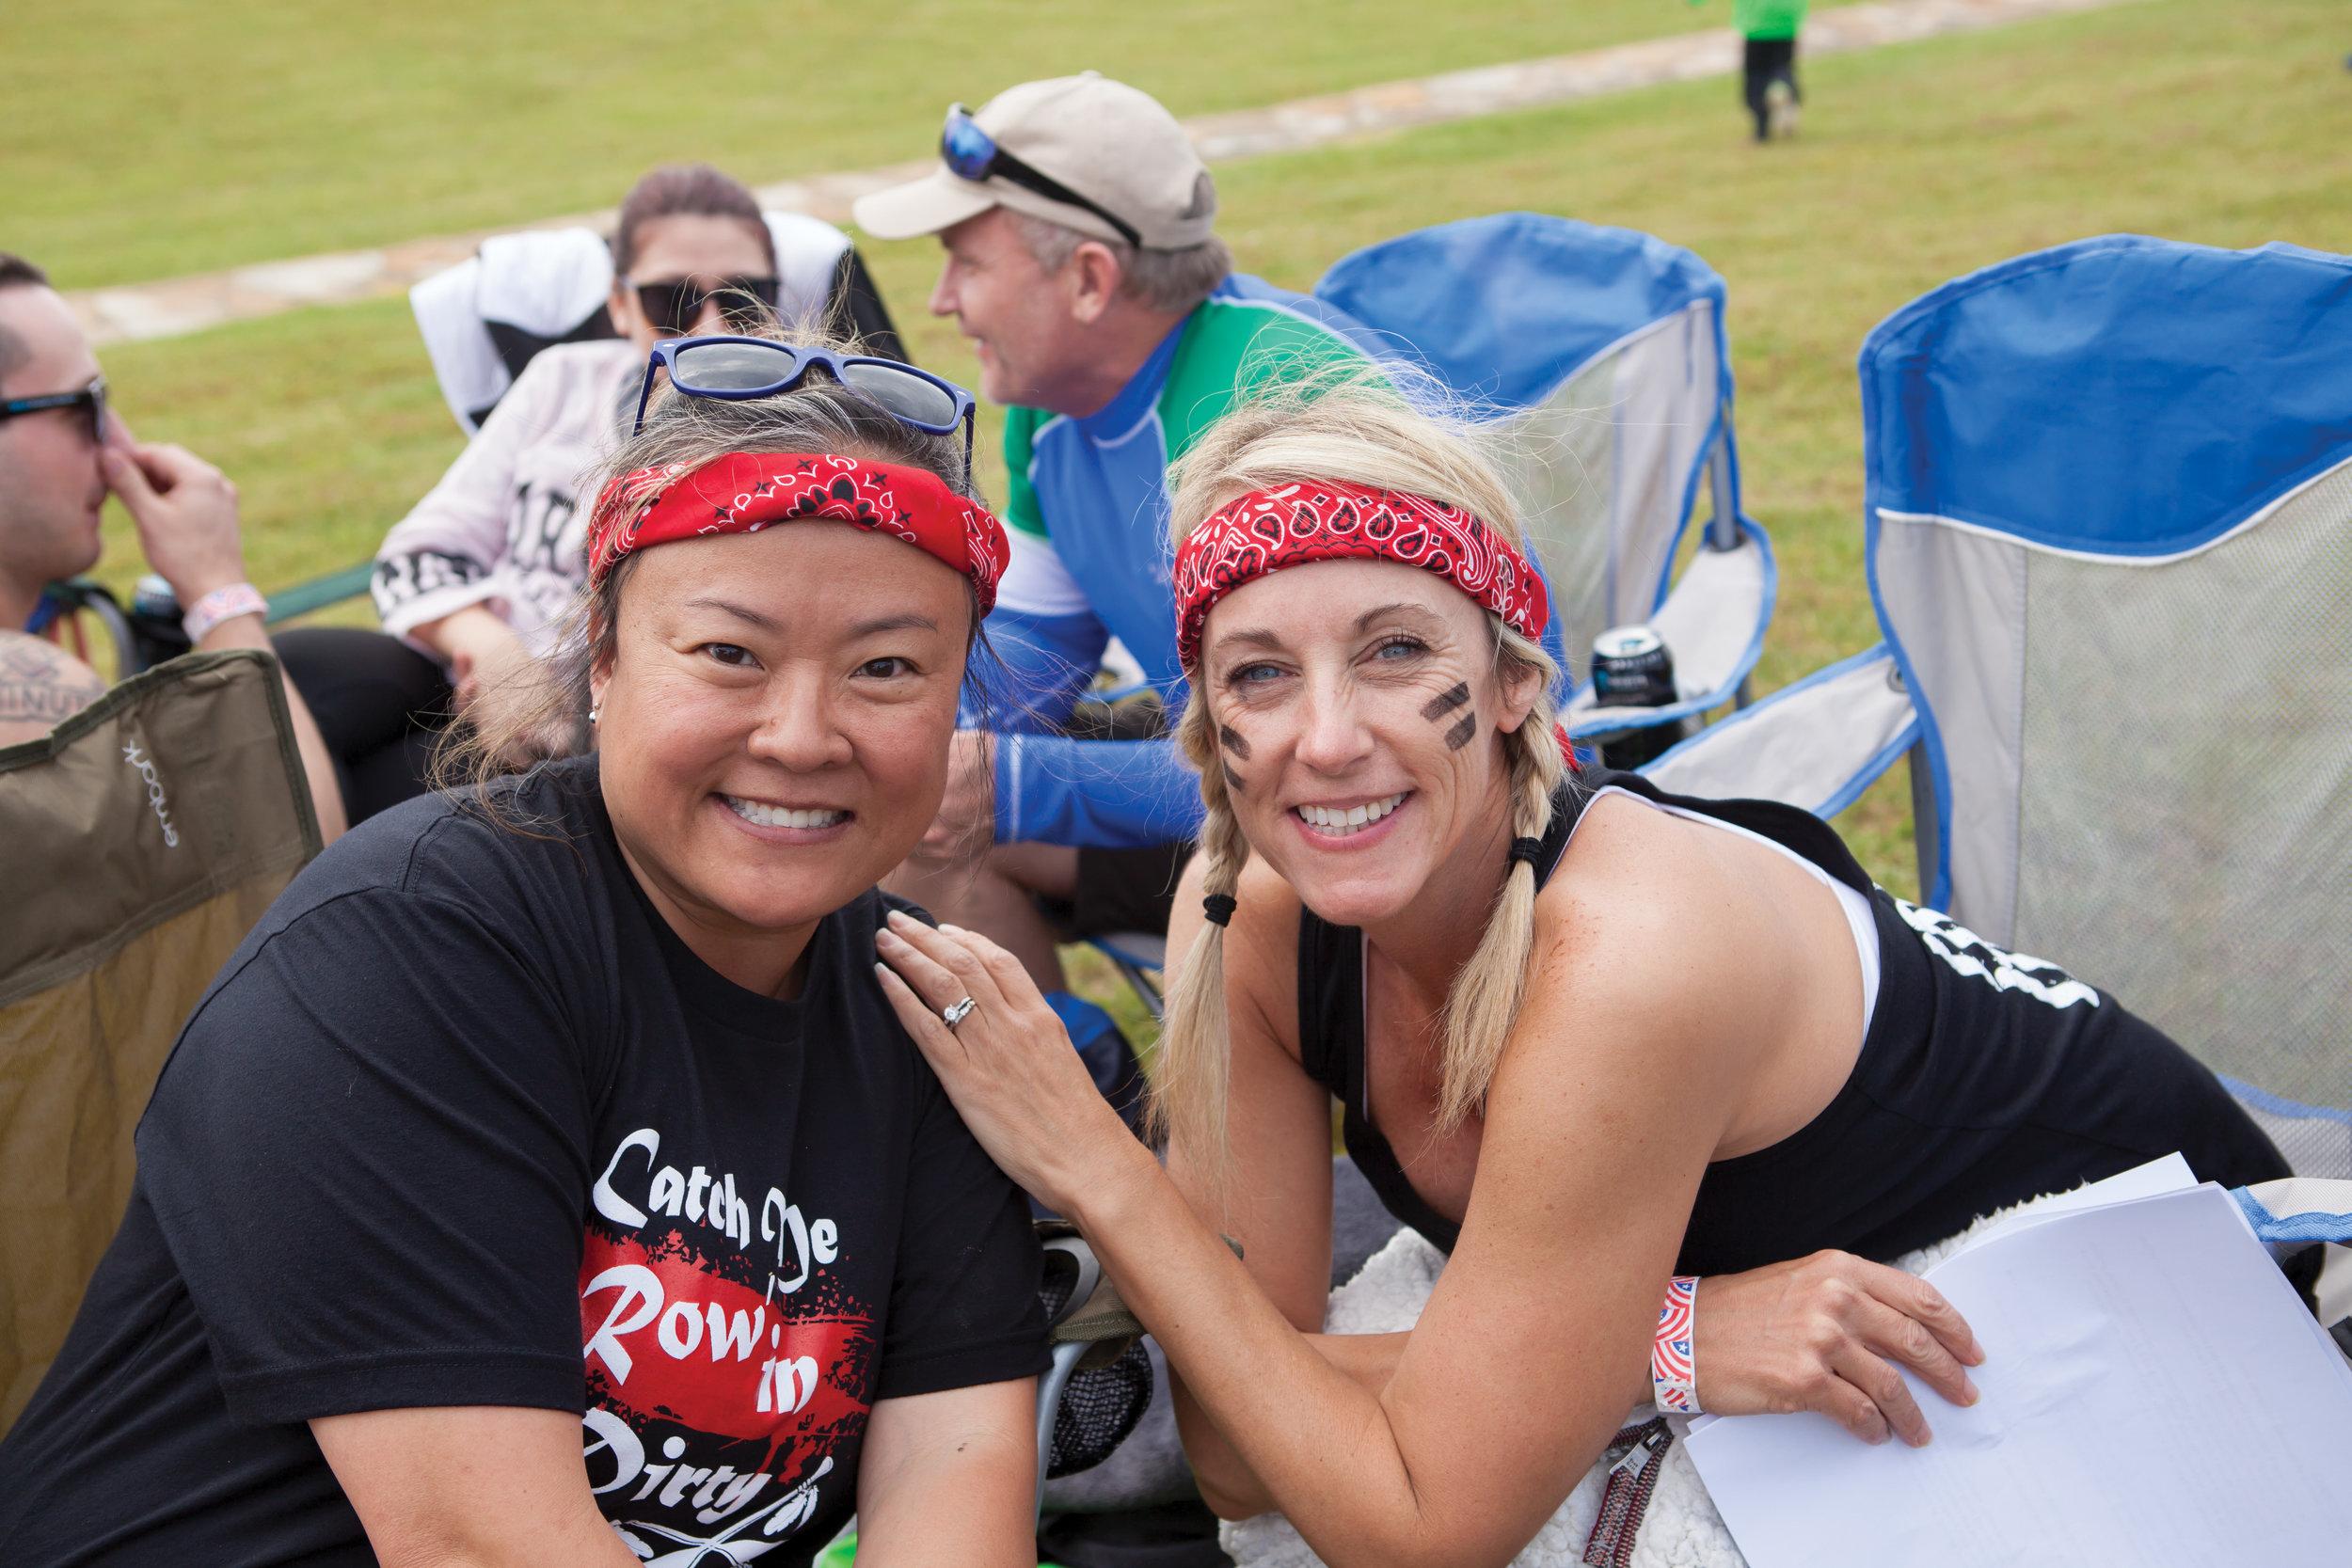 Suki O'Neal and Pam Reynolds